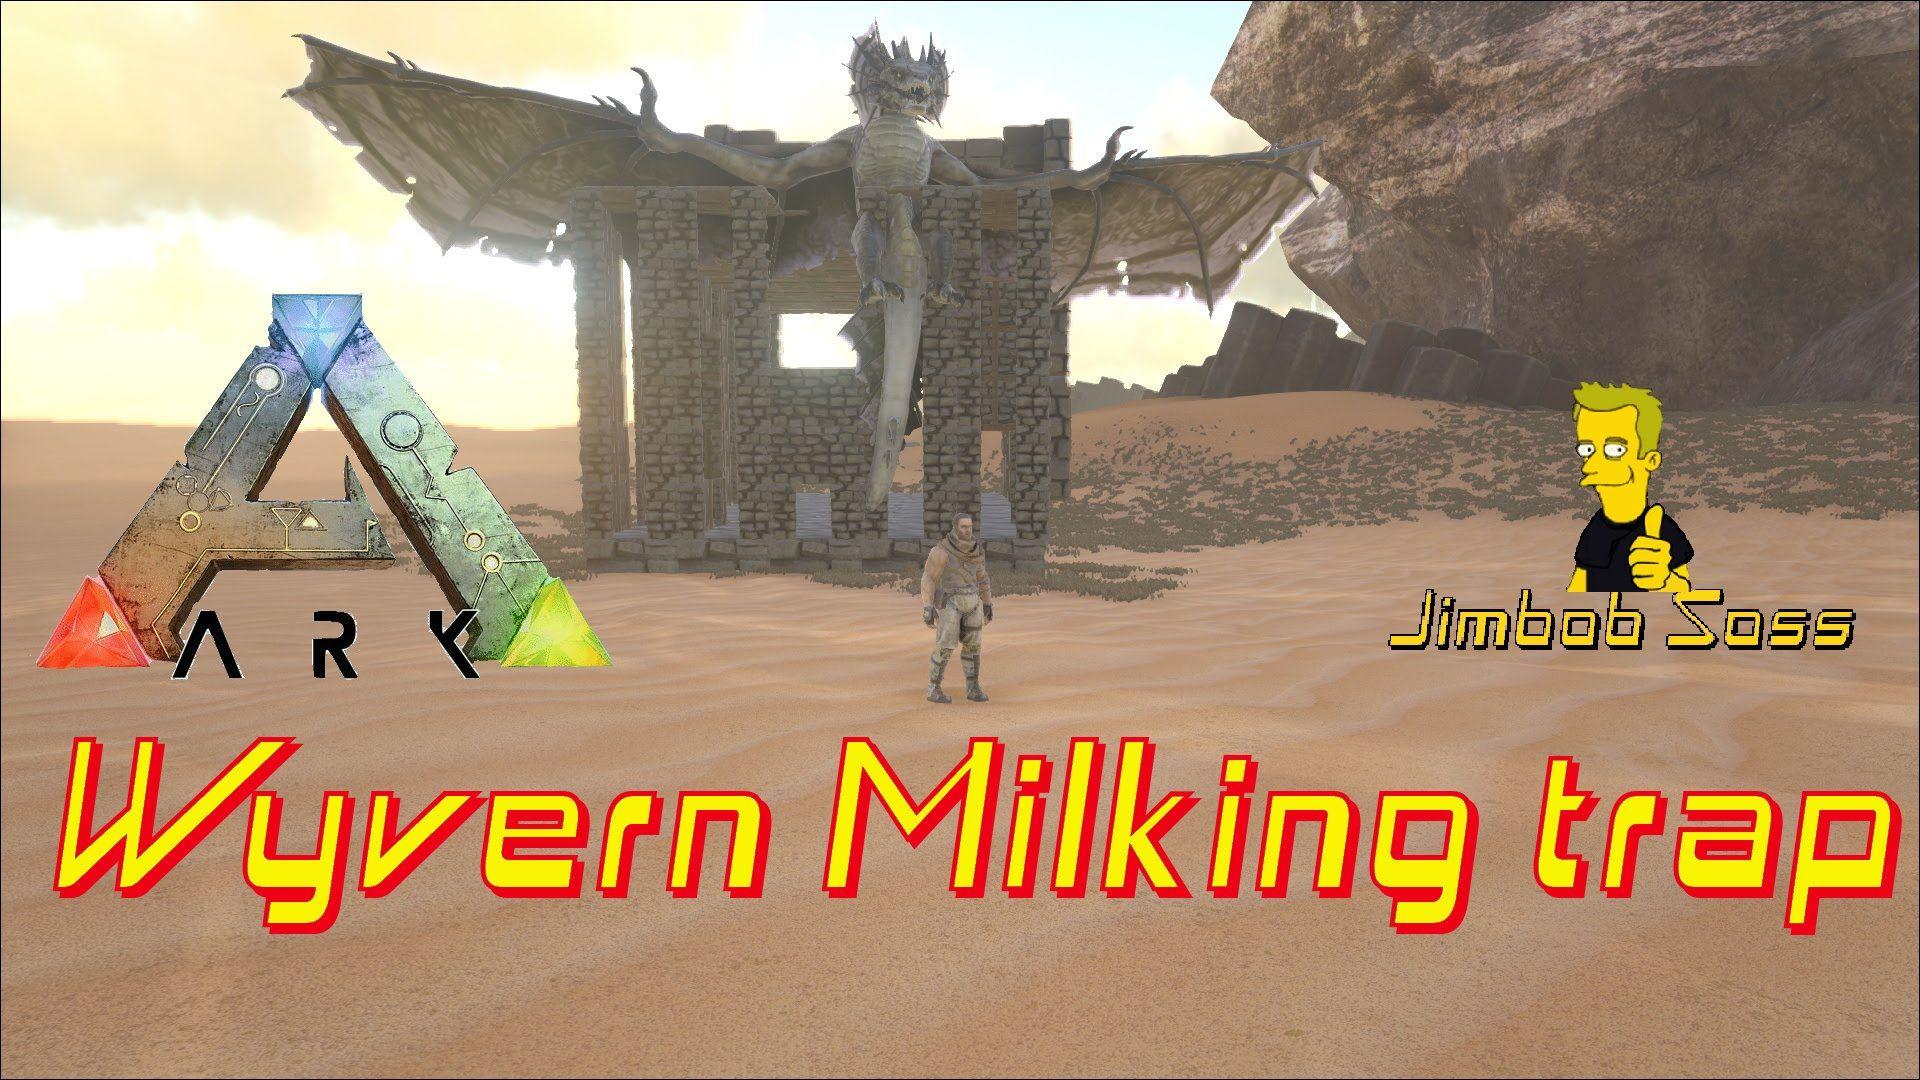 Wyvern Milking trap | Ark | Ark, Survival, Ps4 games